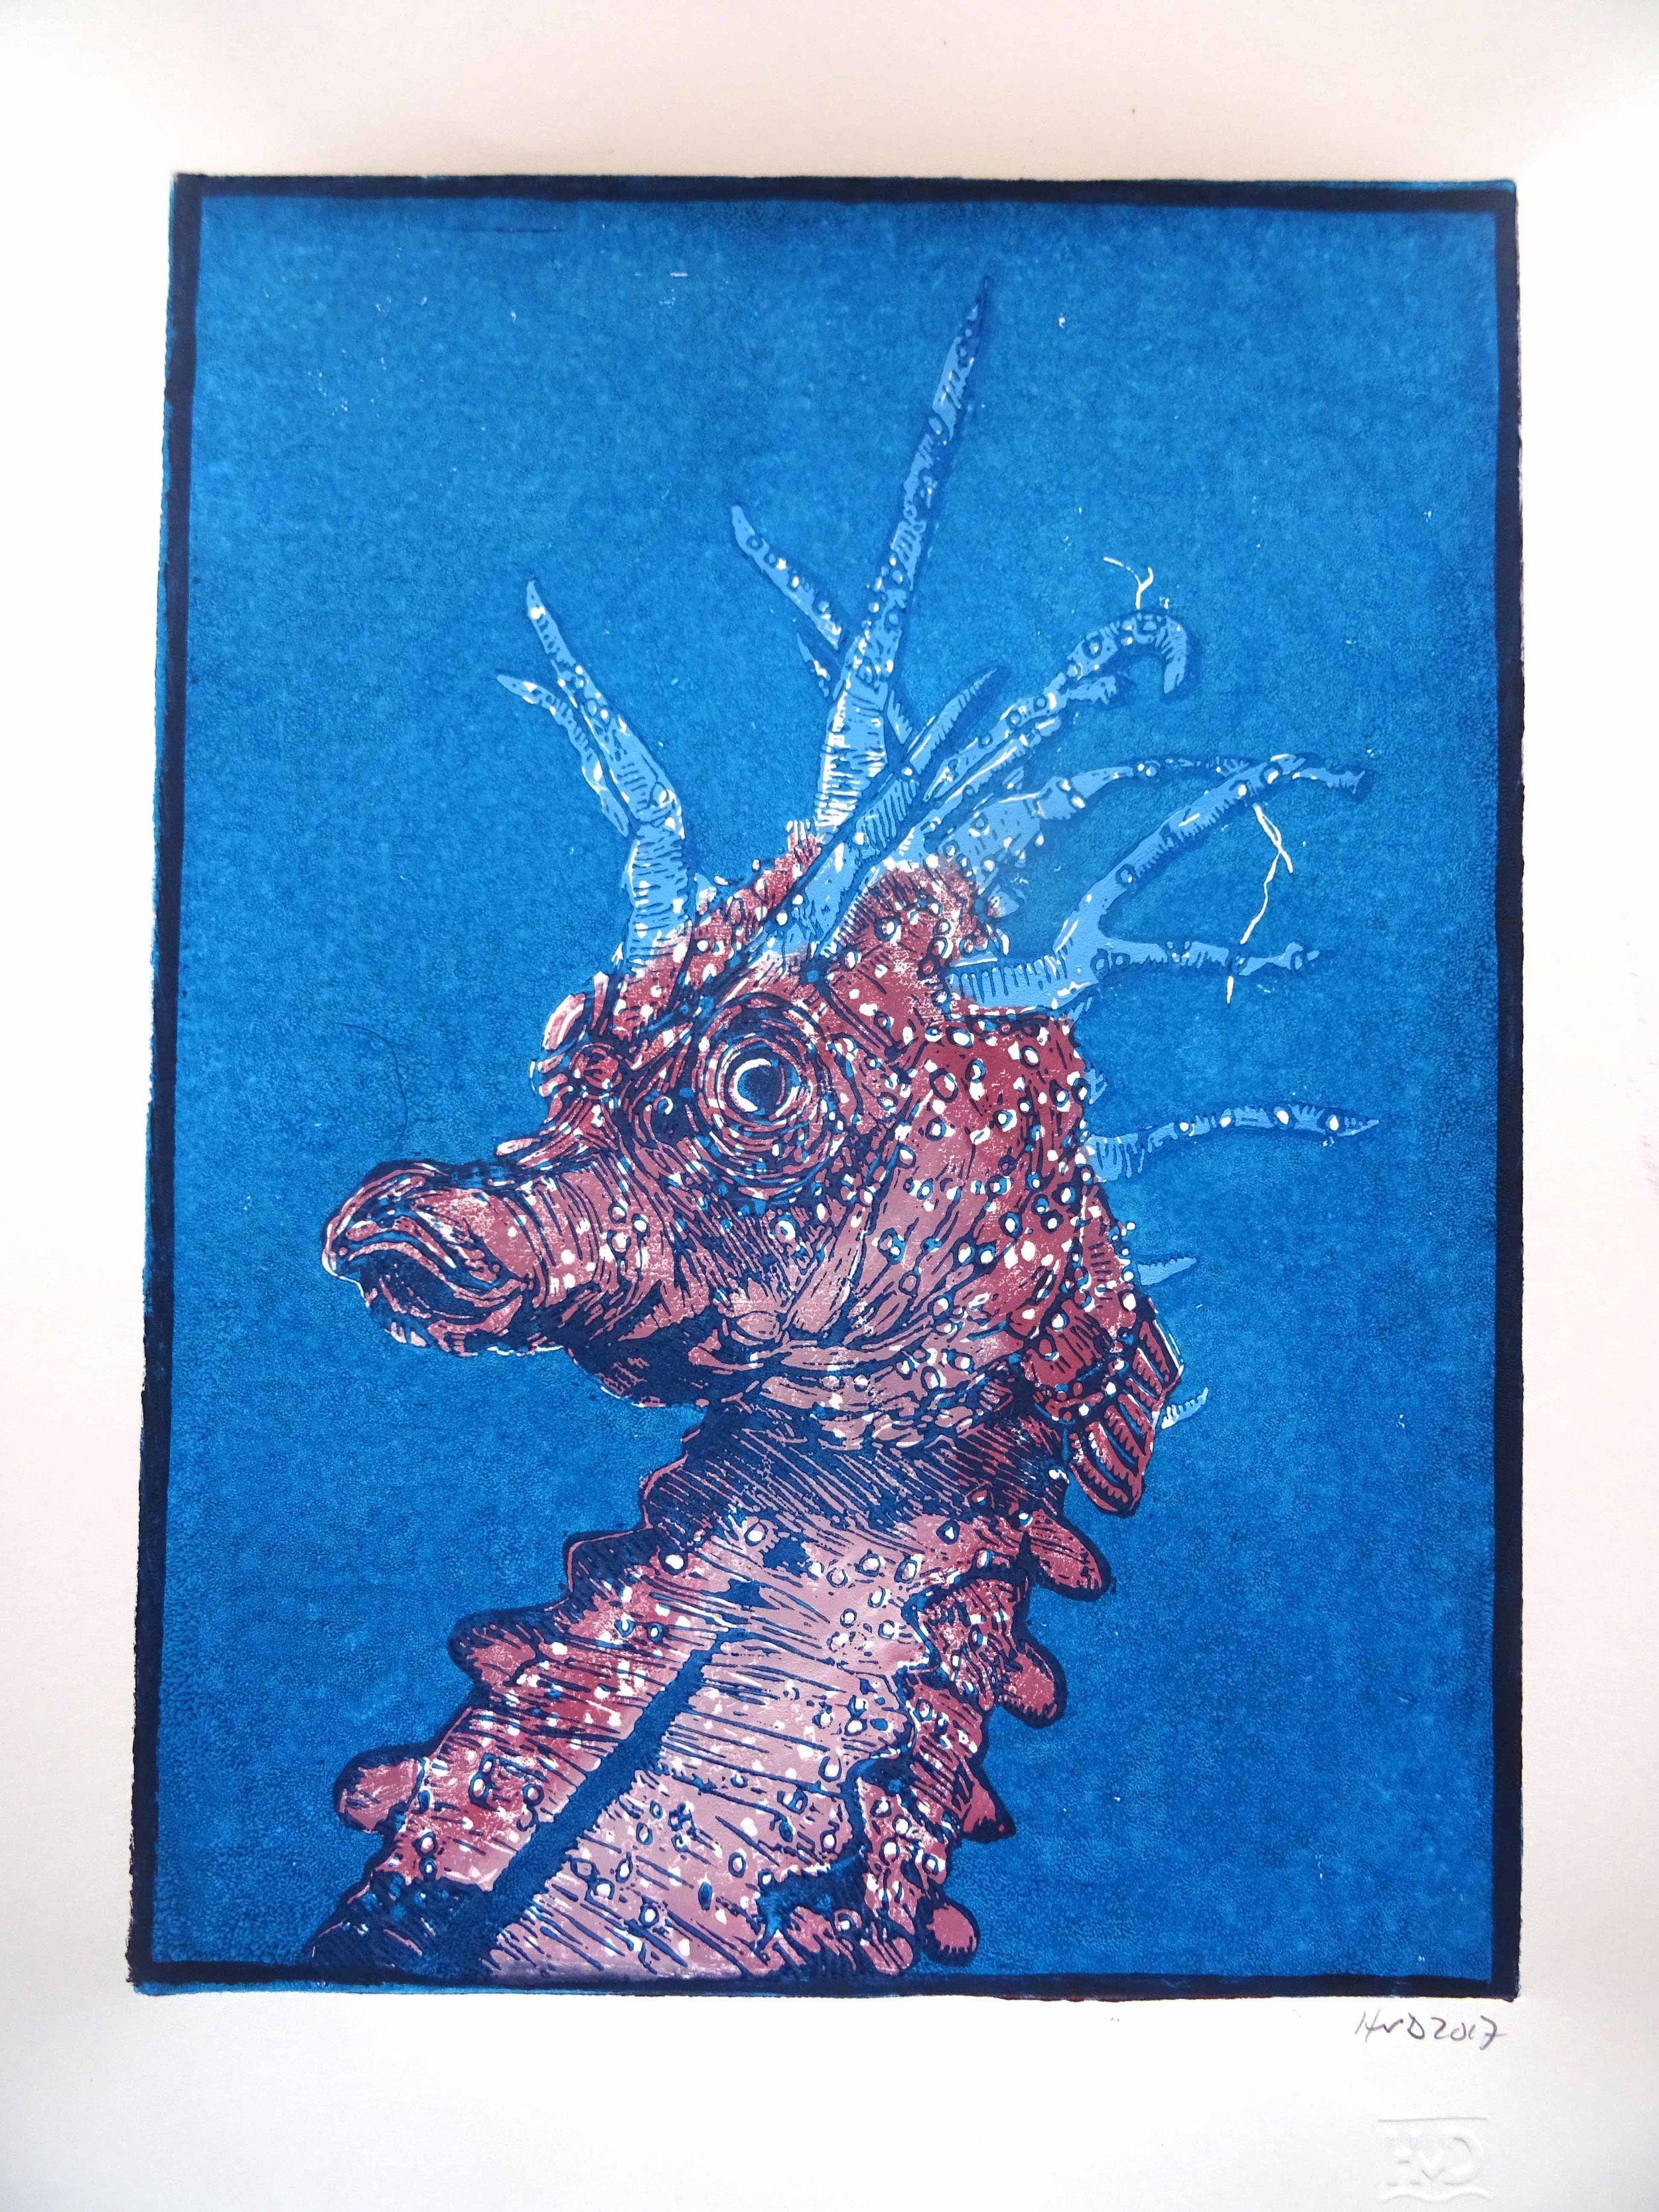 171-1, hippocampe 2, 28x21cm, 2 plate lino, 80 €